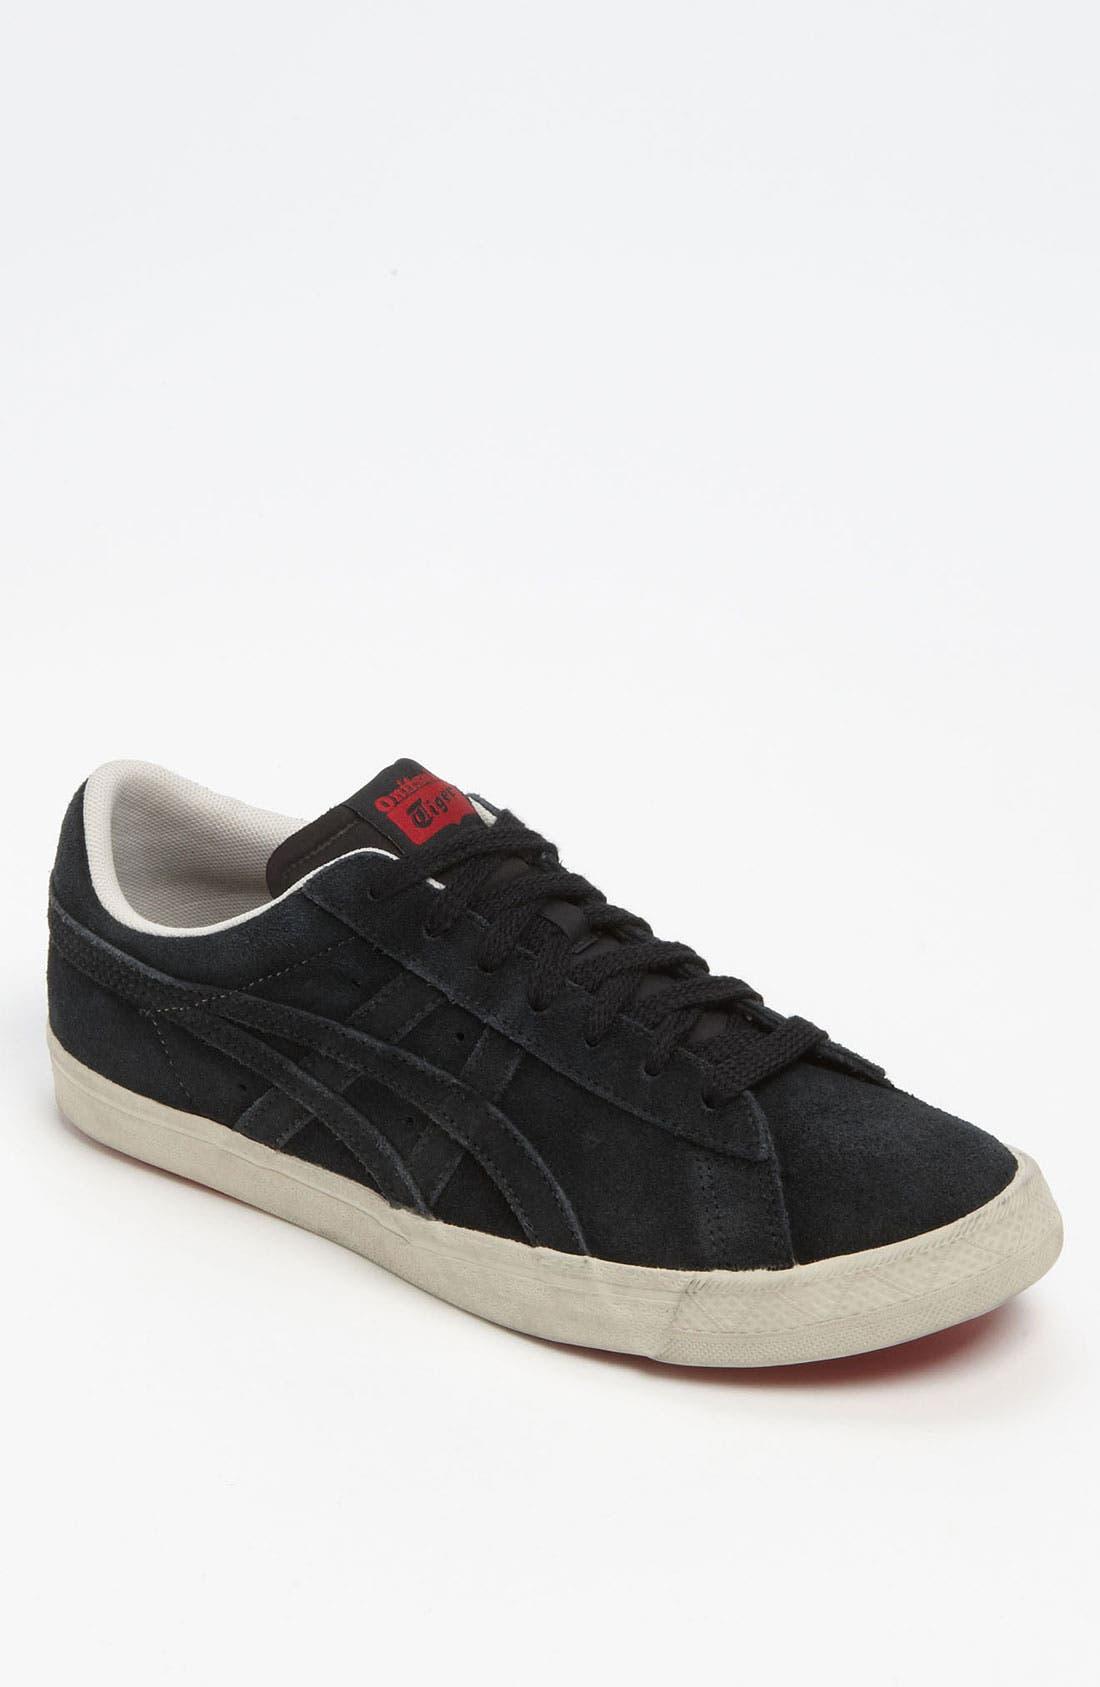 Main Image - Onitsuka Tiger™ 'Fabre BL-S' Sneaker (Men)